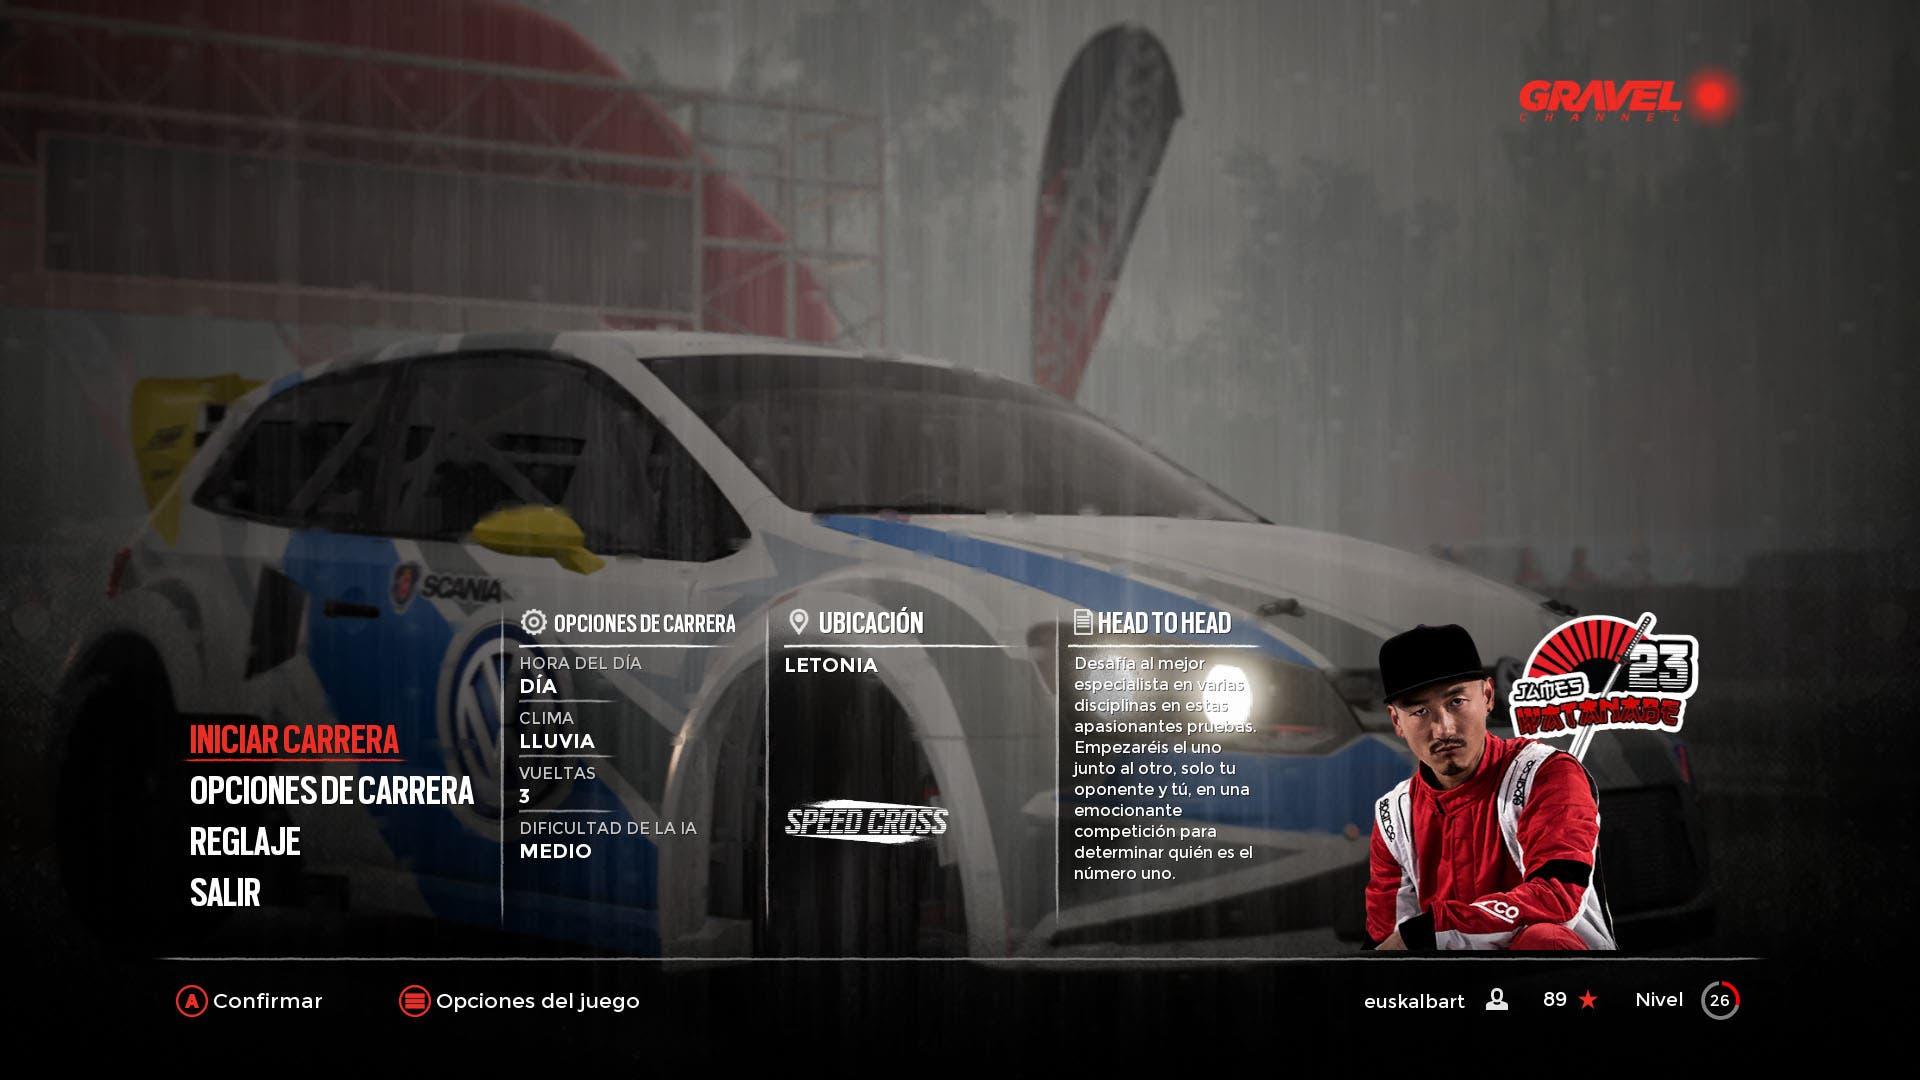 Análisis de Gravel - Xbox One 8